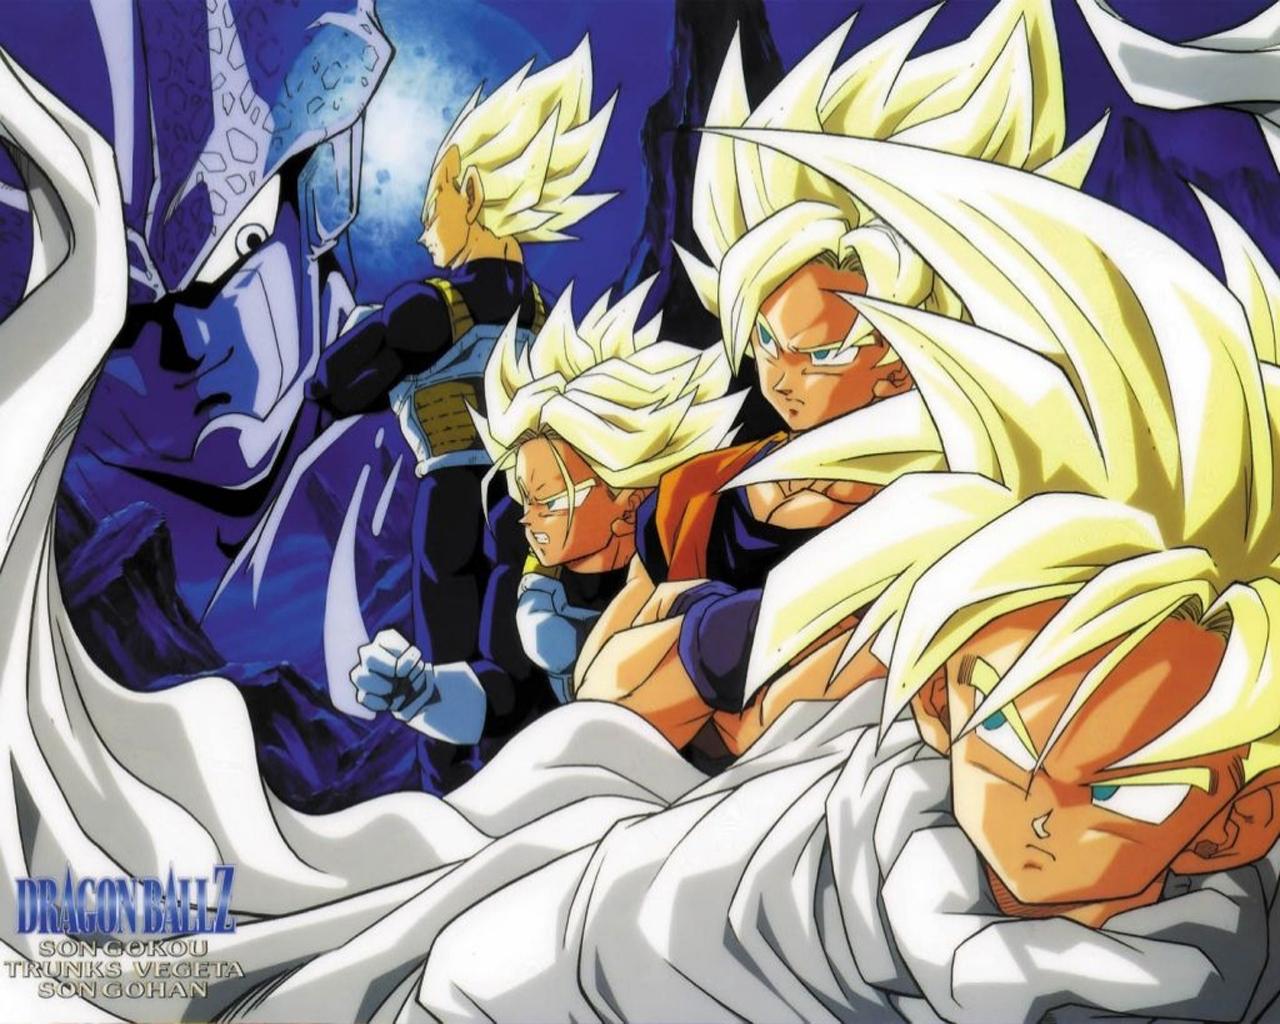 Dragon Ball Z Wallpapers Gohan: Son Gohan Wallpaper.jpg